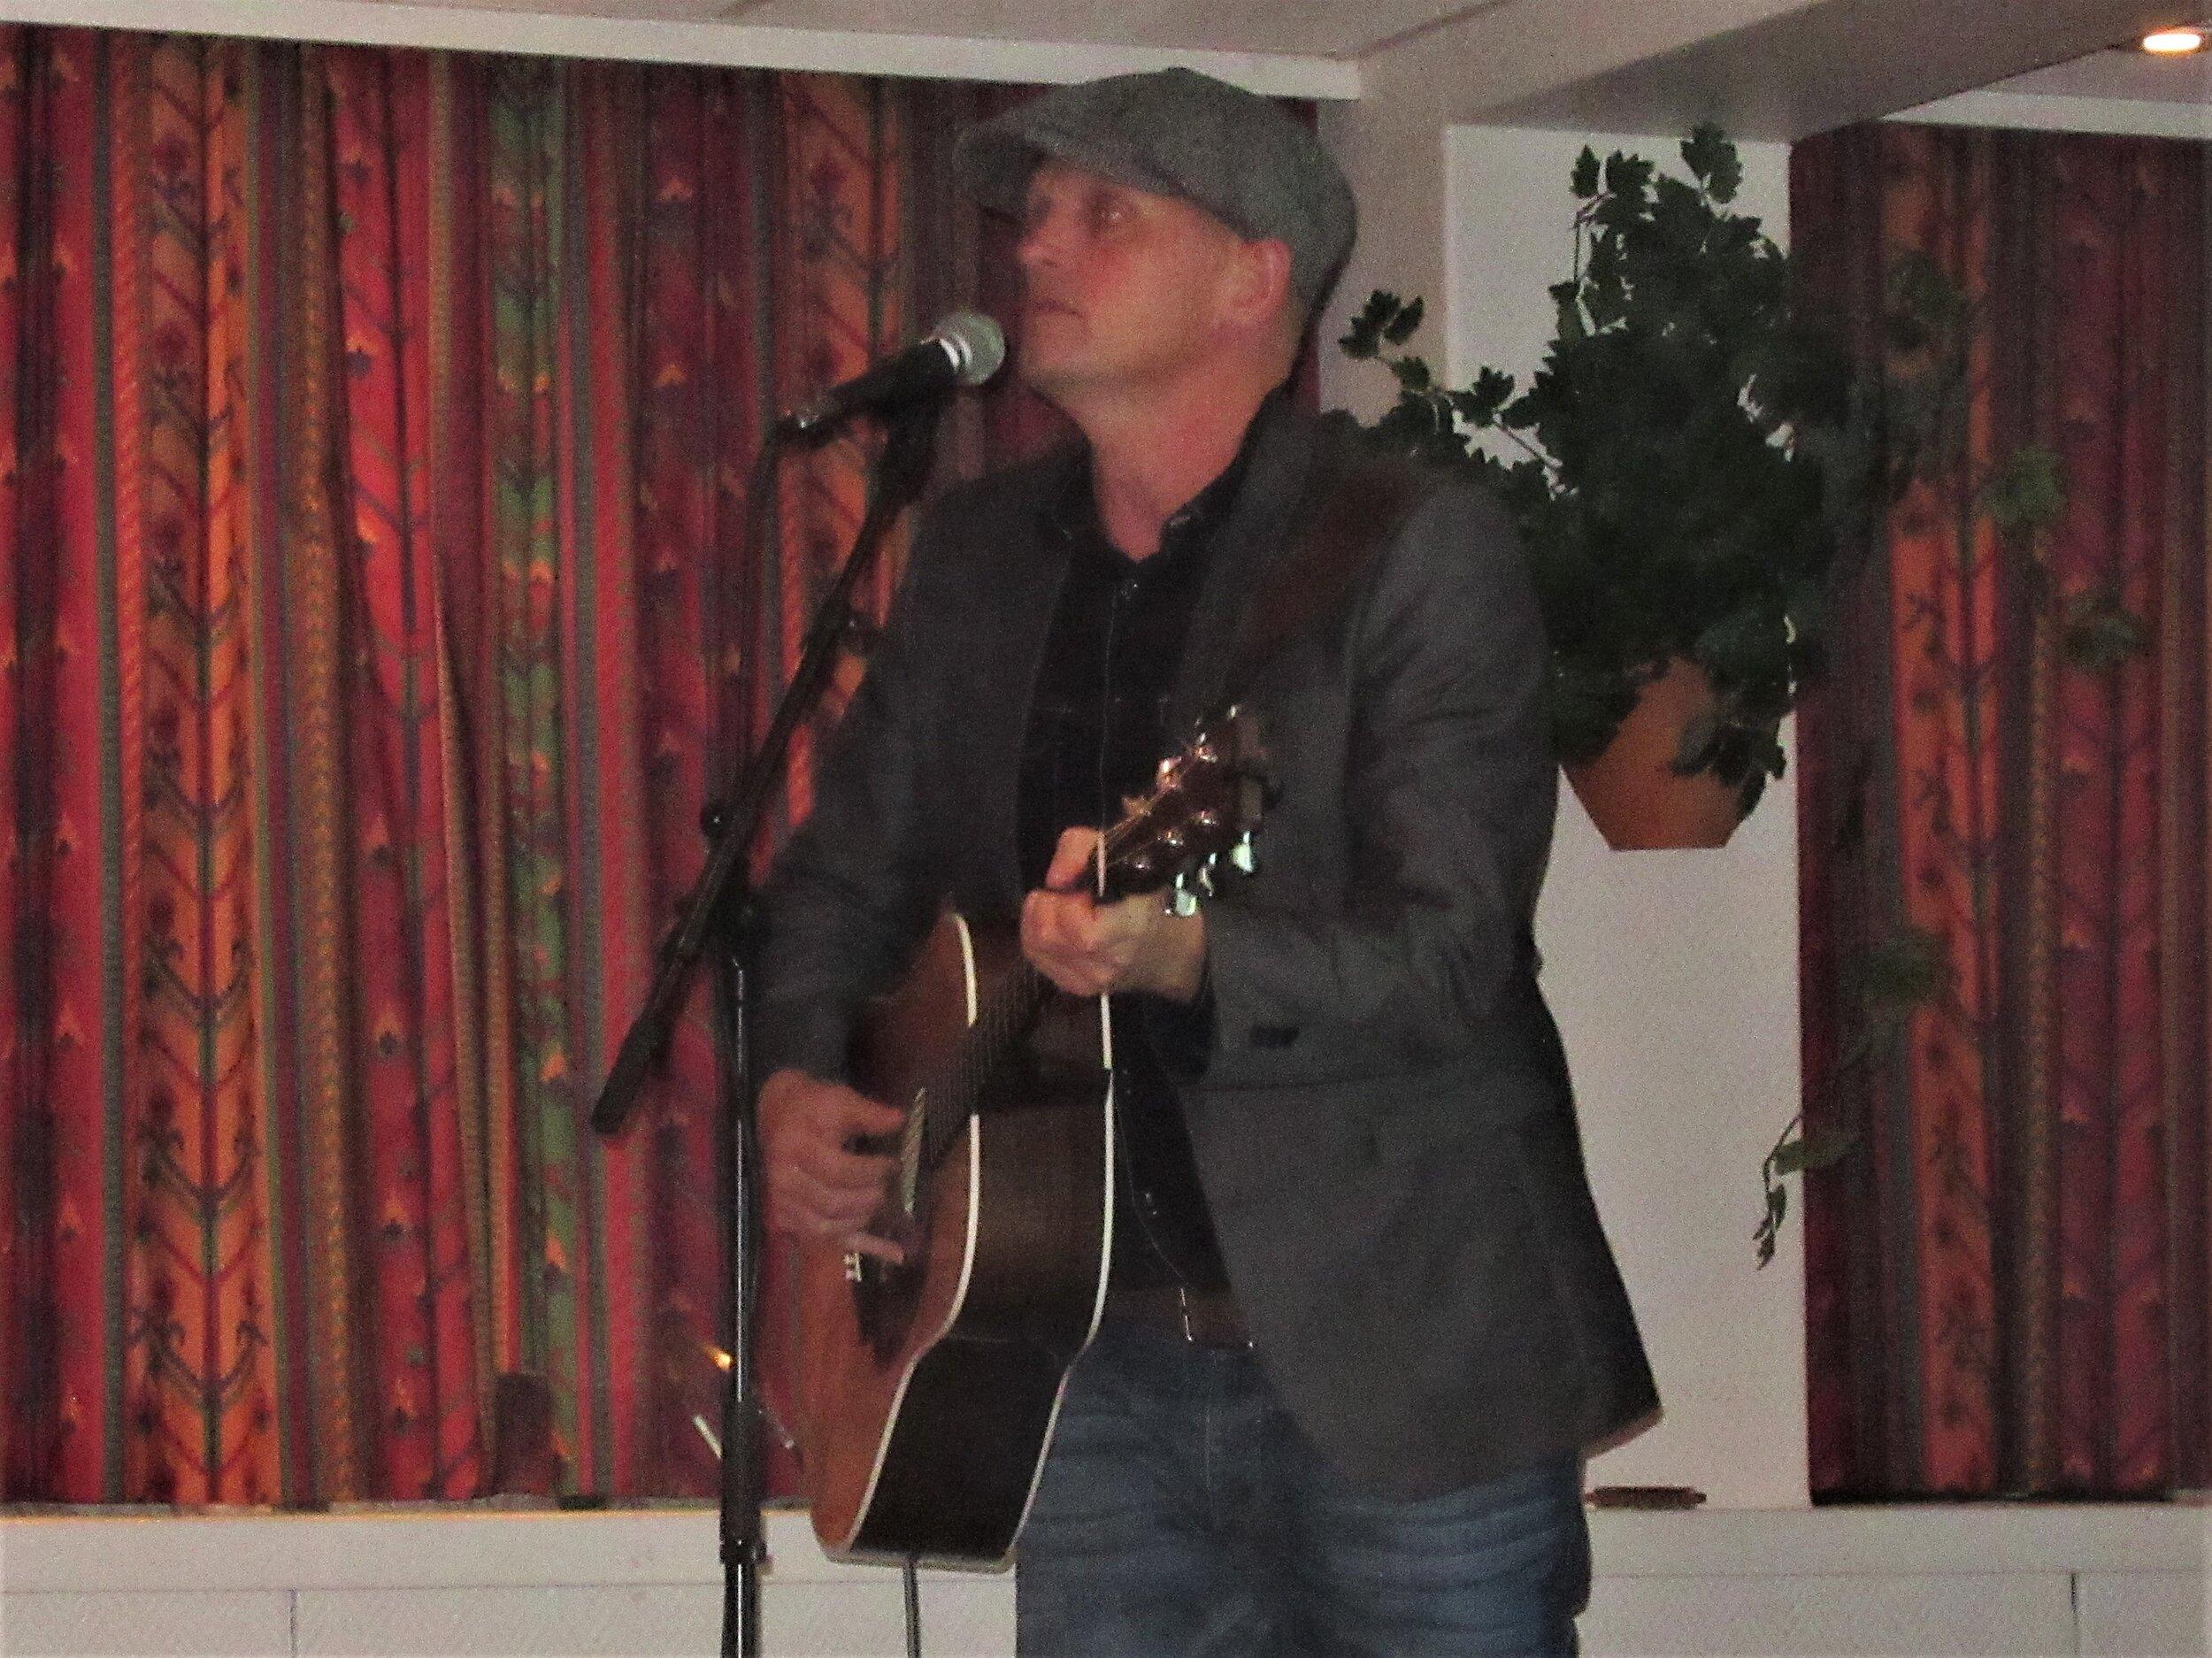 Gunnar Yttri skapte god stemning i salen med singitar, munnspel og songstemme